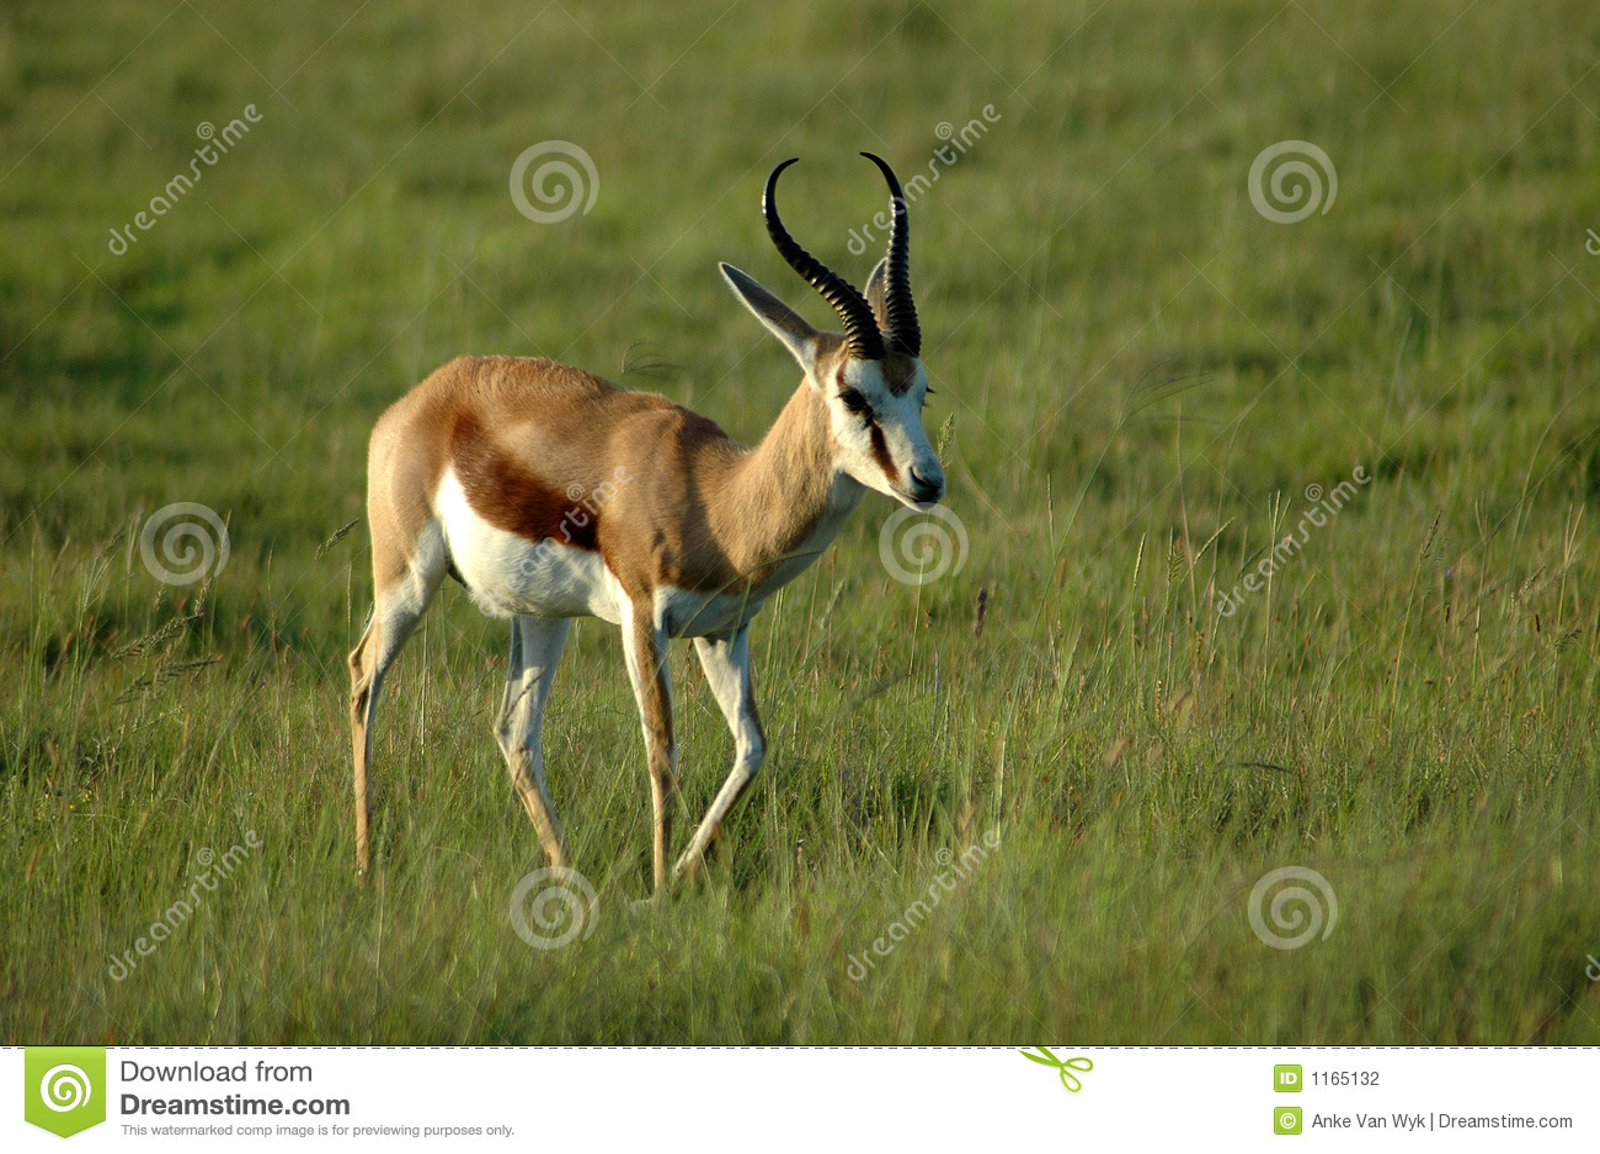 Springbock Stock Photo. Image Of Buck, Deer, Bush, Animal